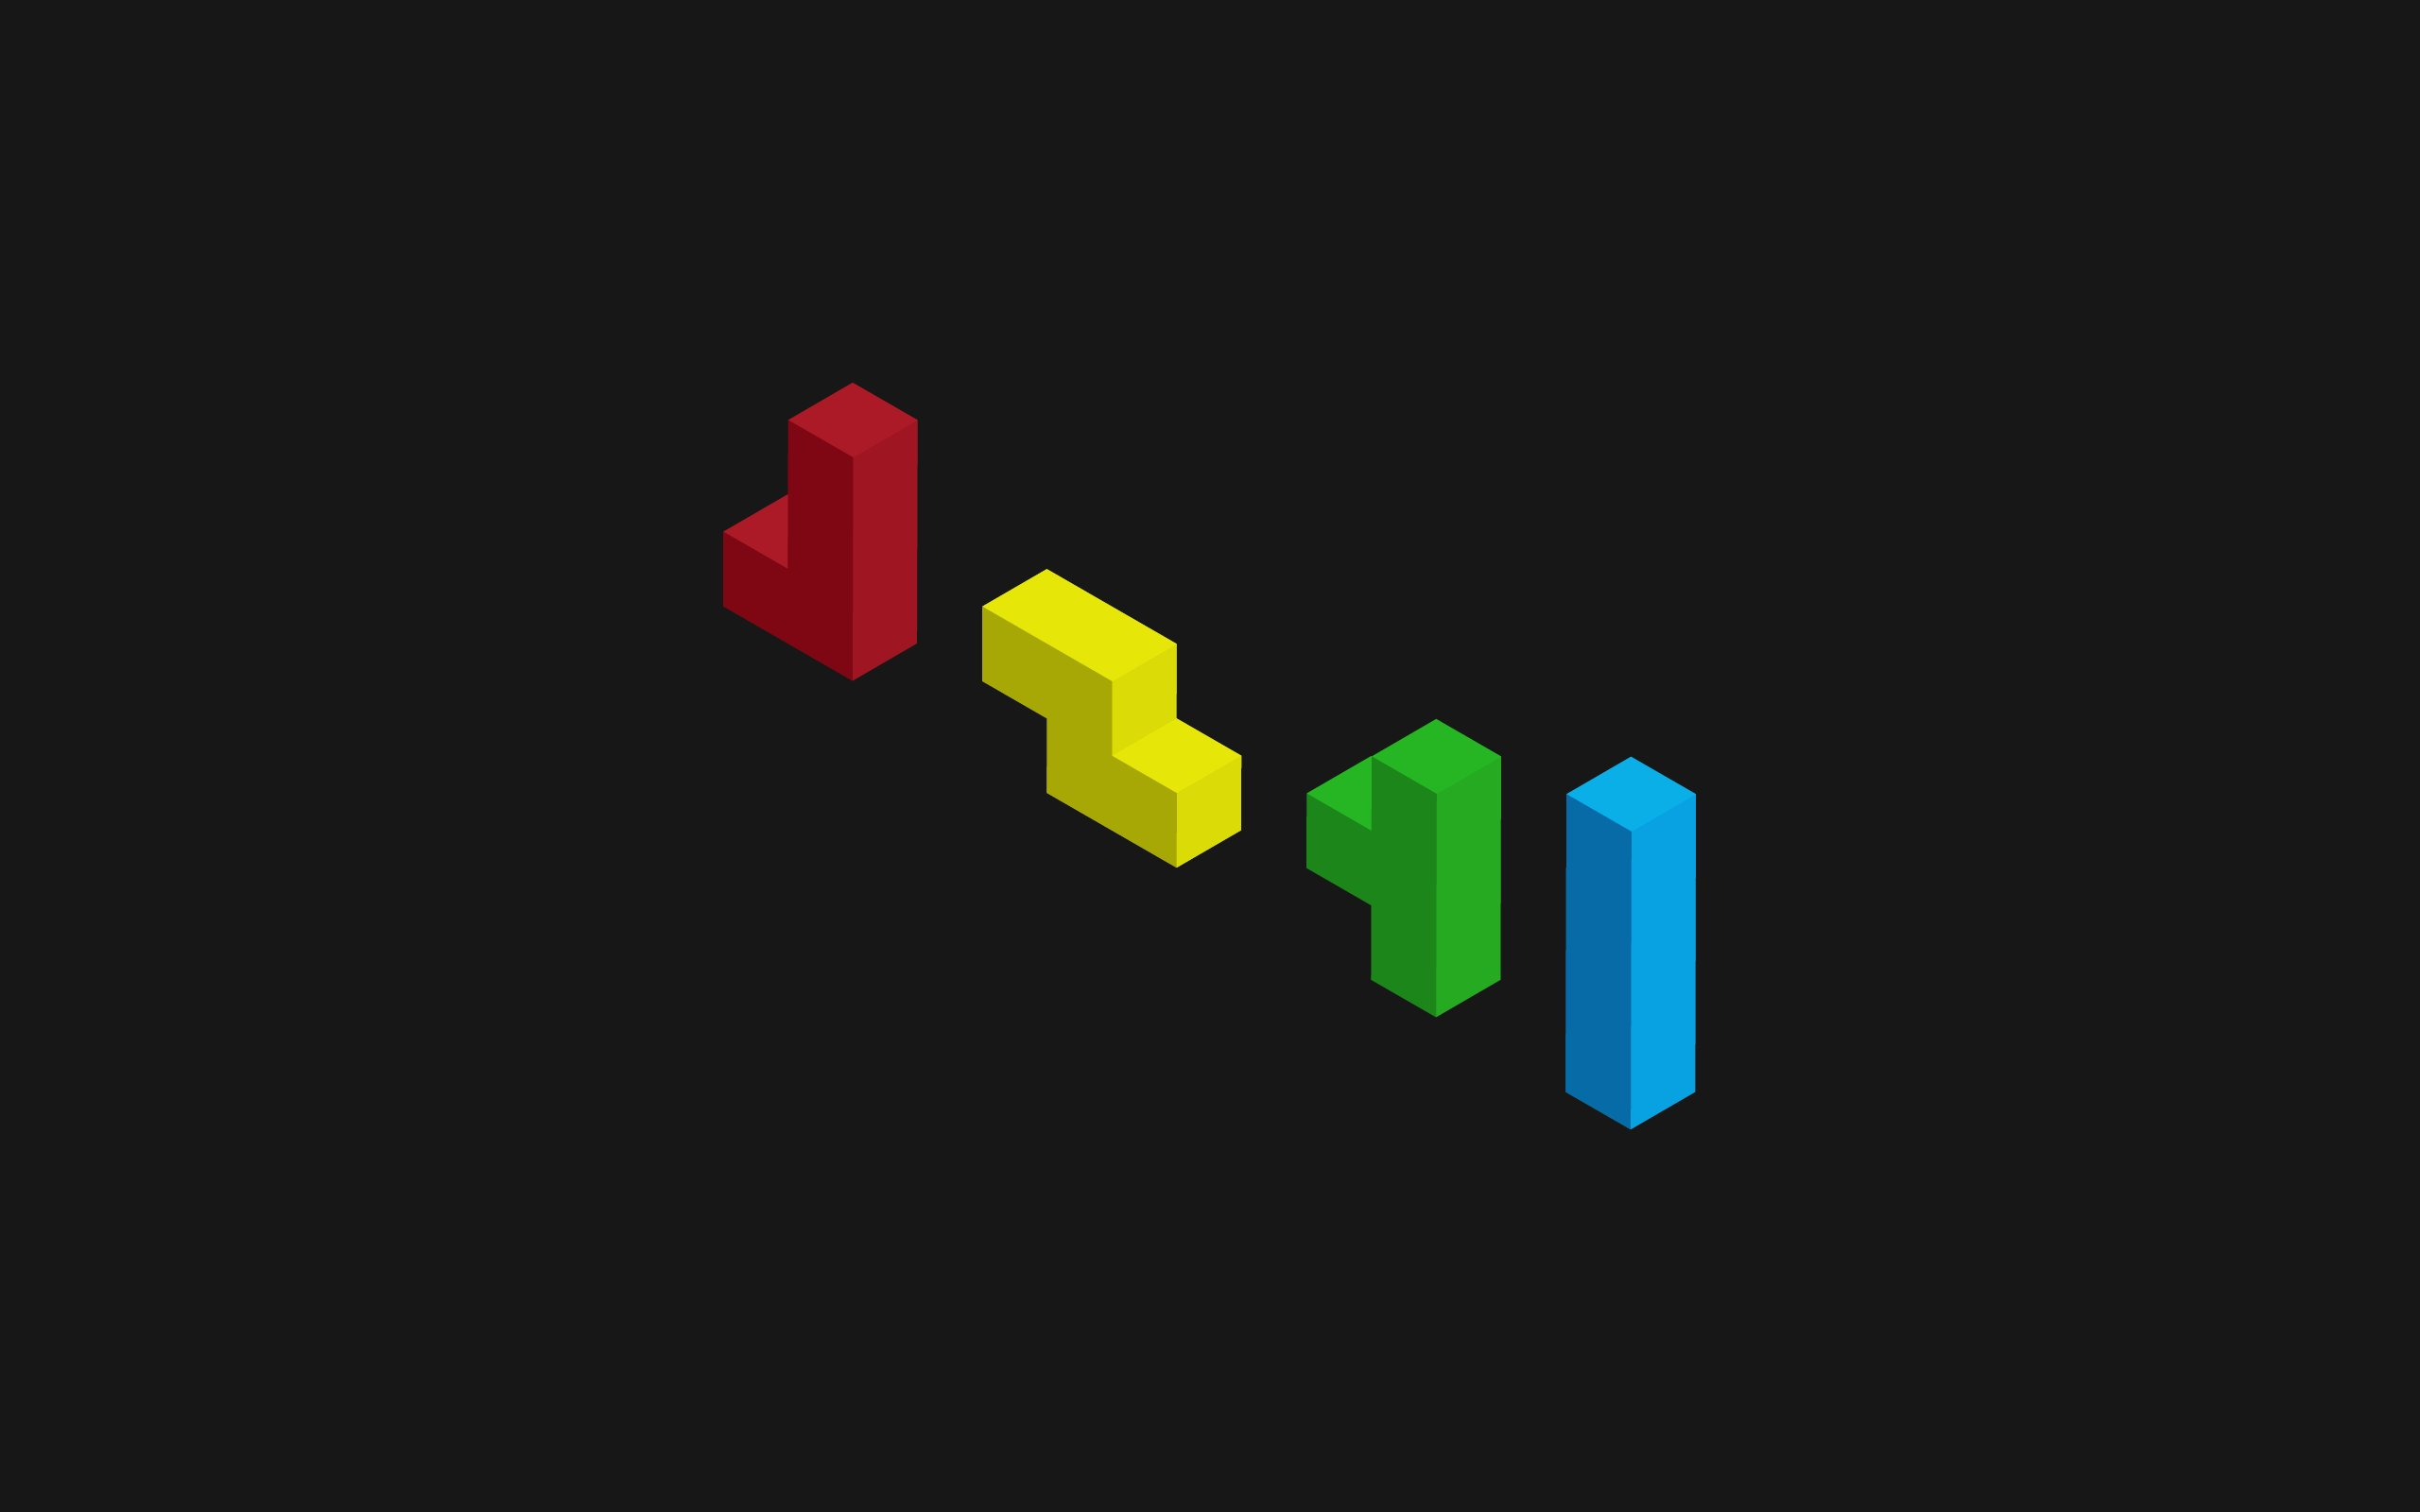 minimalist tetris game videogames wallpaper background 2560x1600